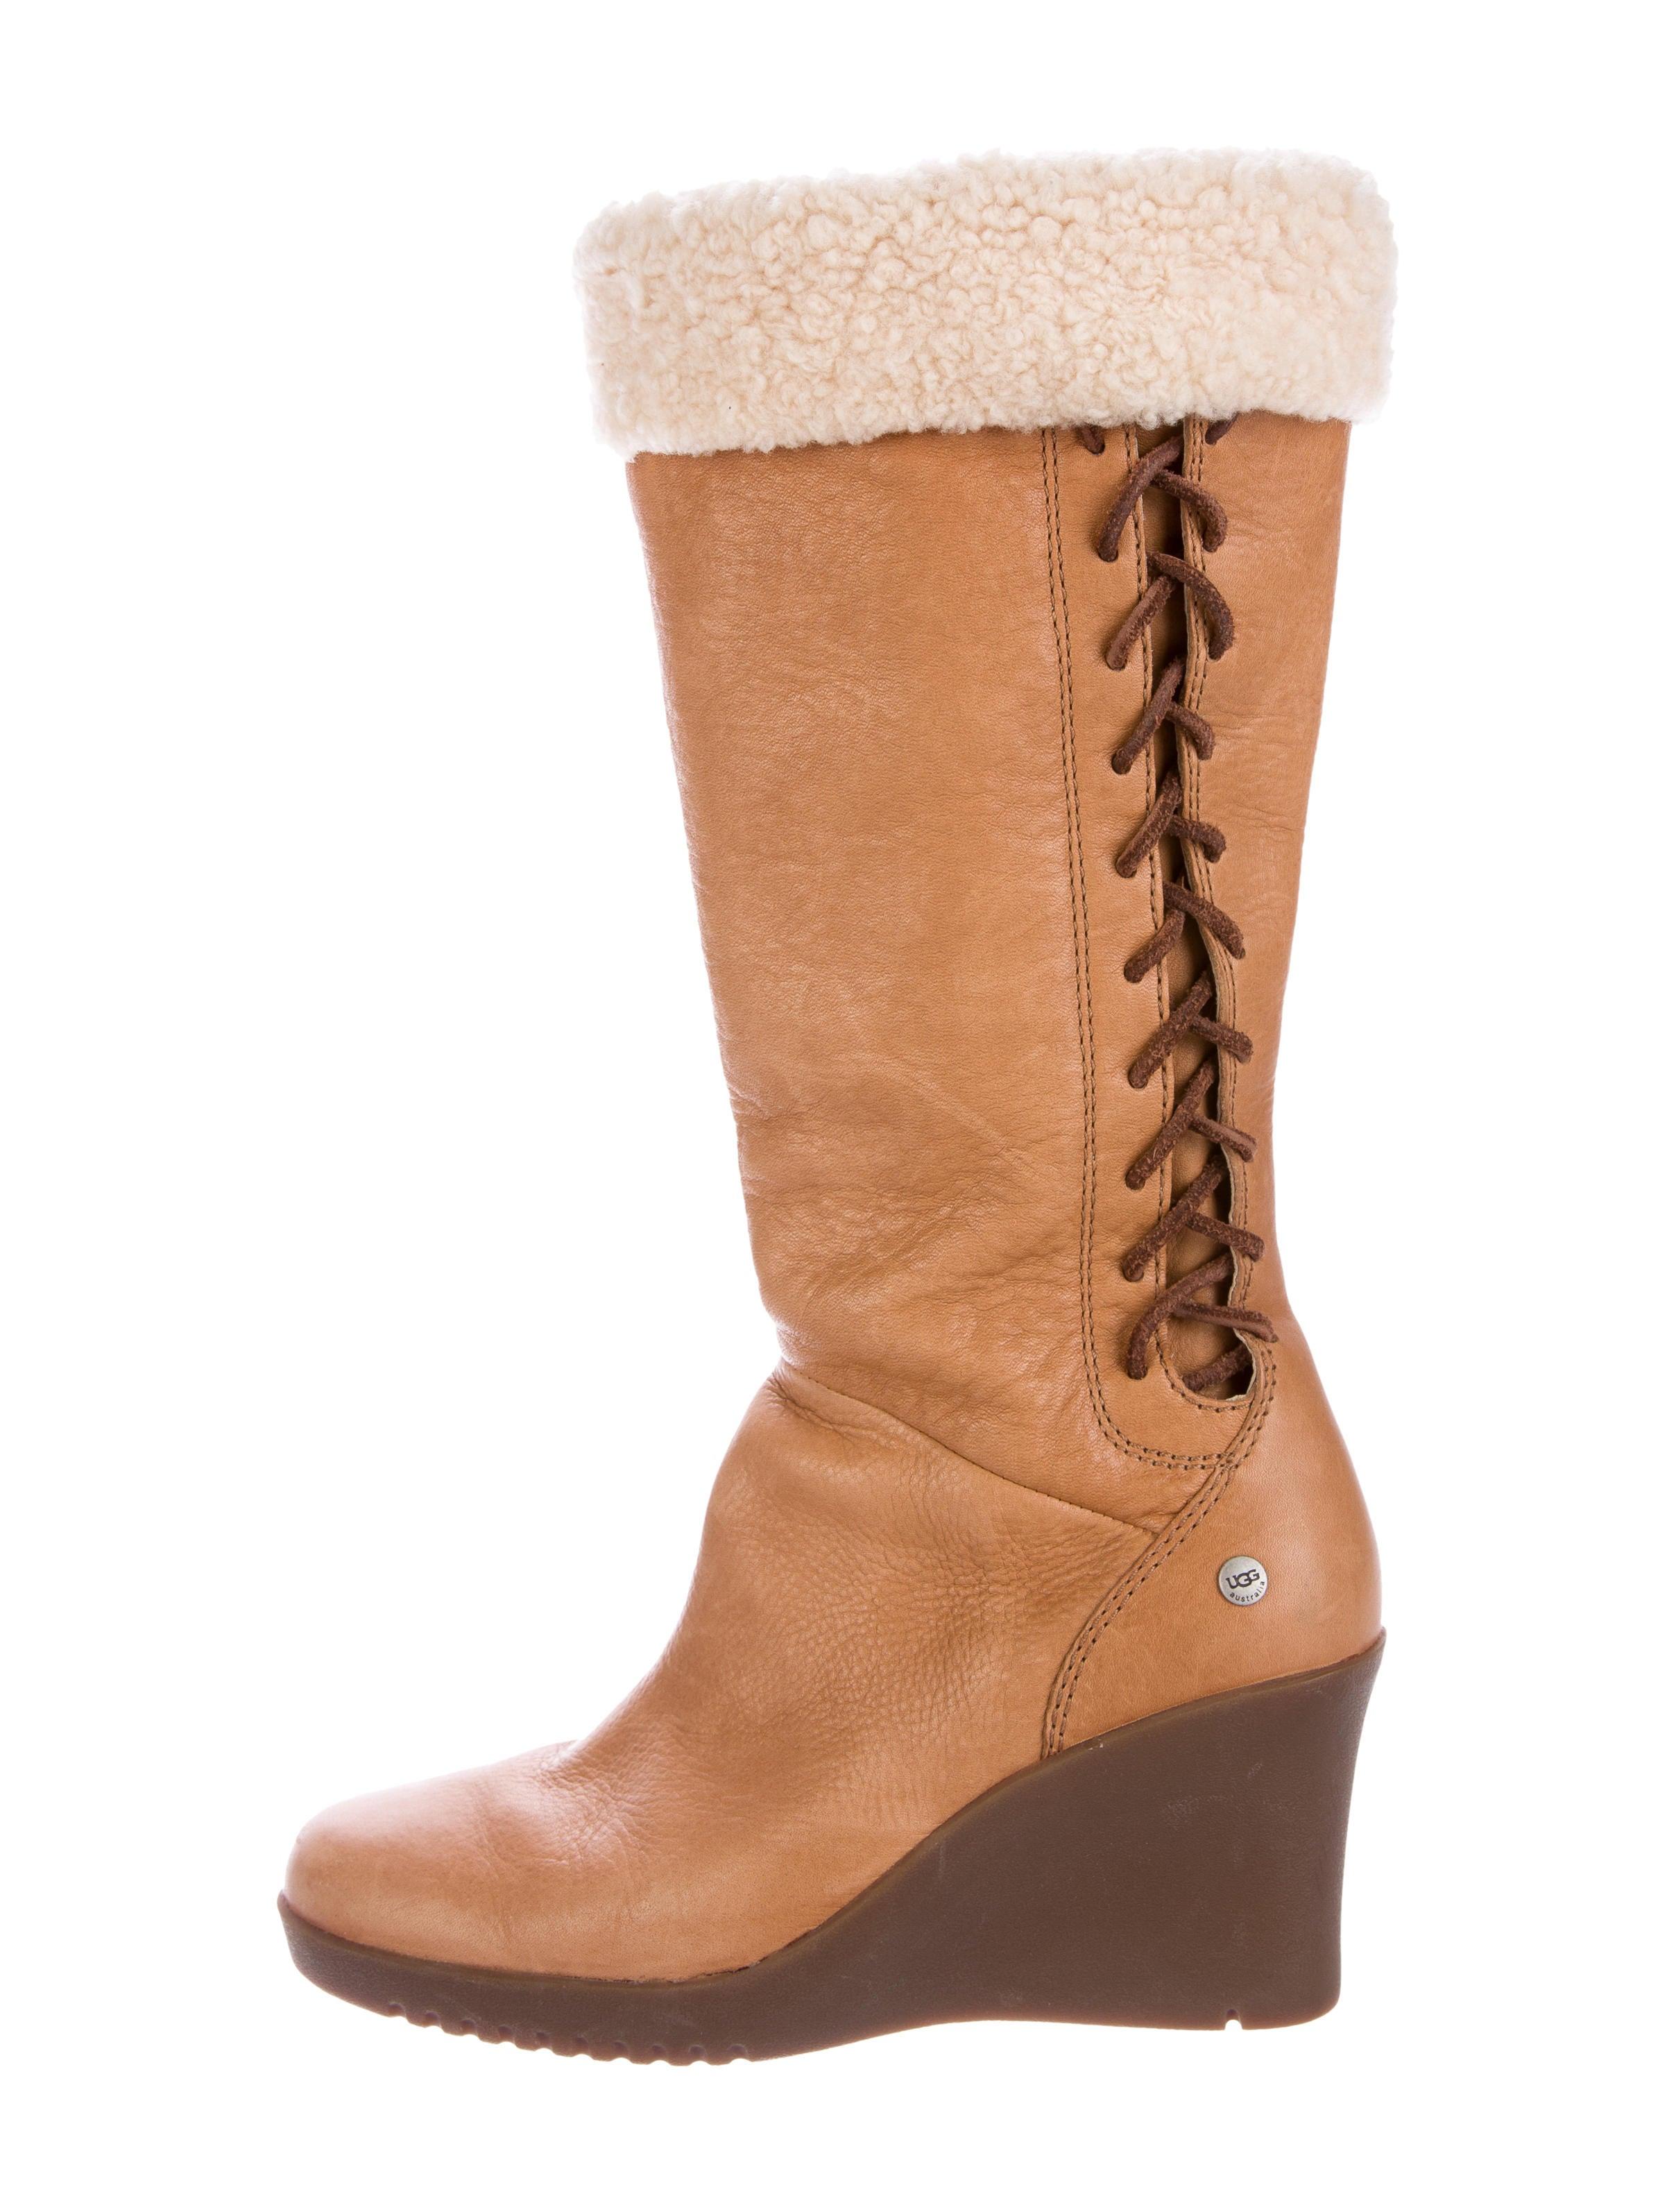 ugg australia shearling wedge boots shoes wuugg20947